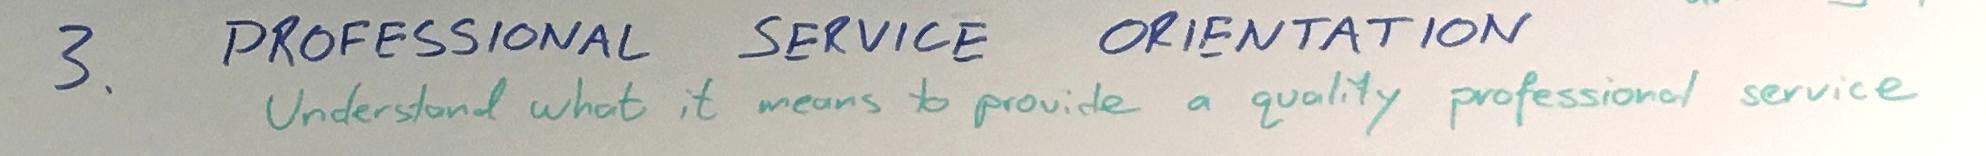 Professional Service Orientation